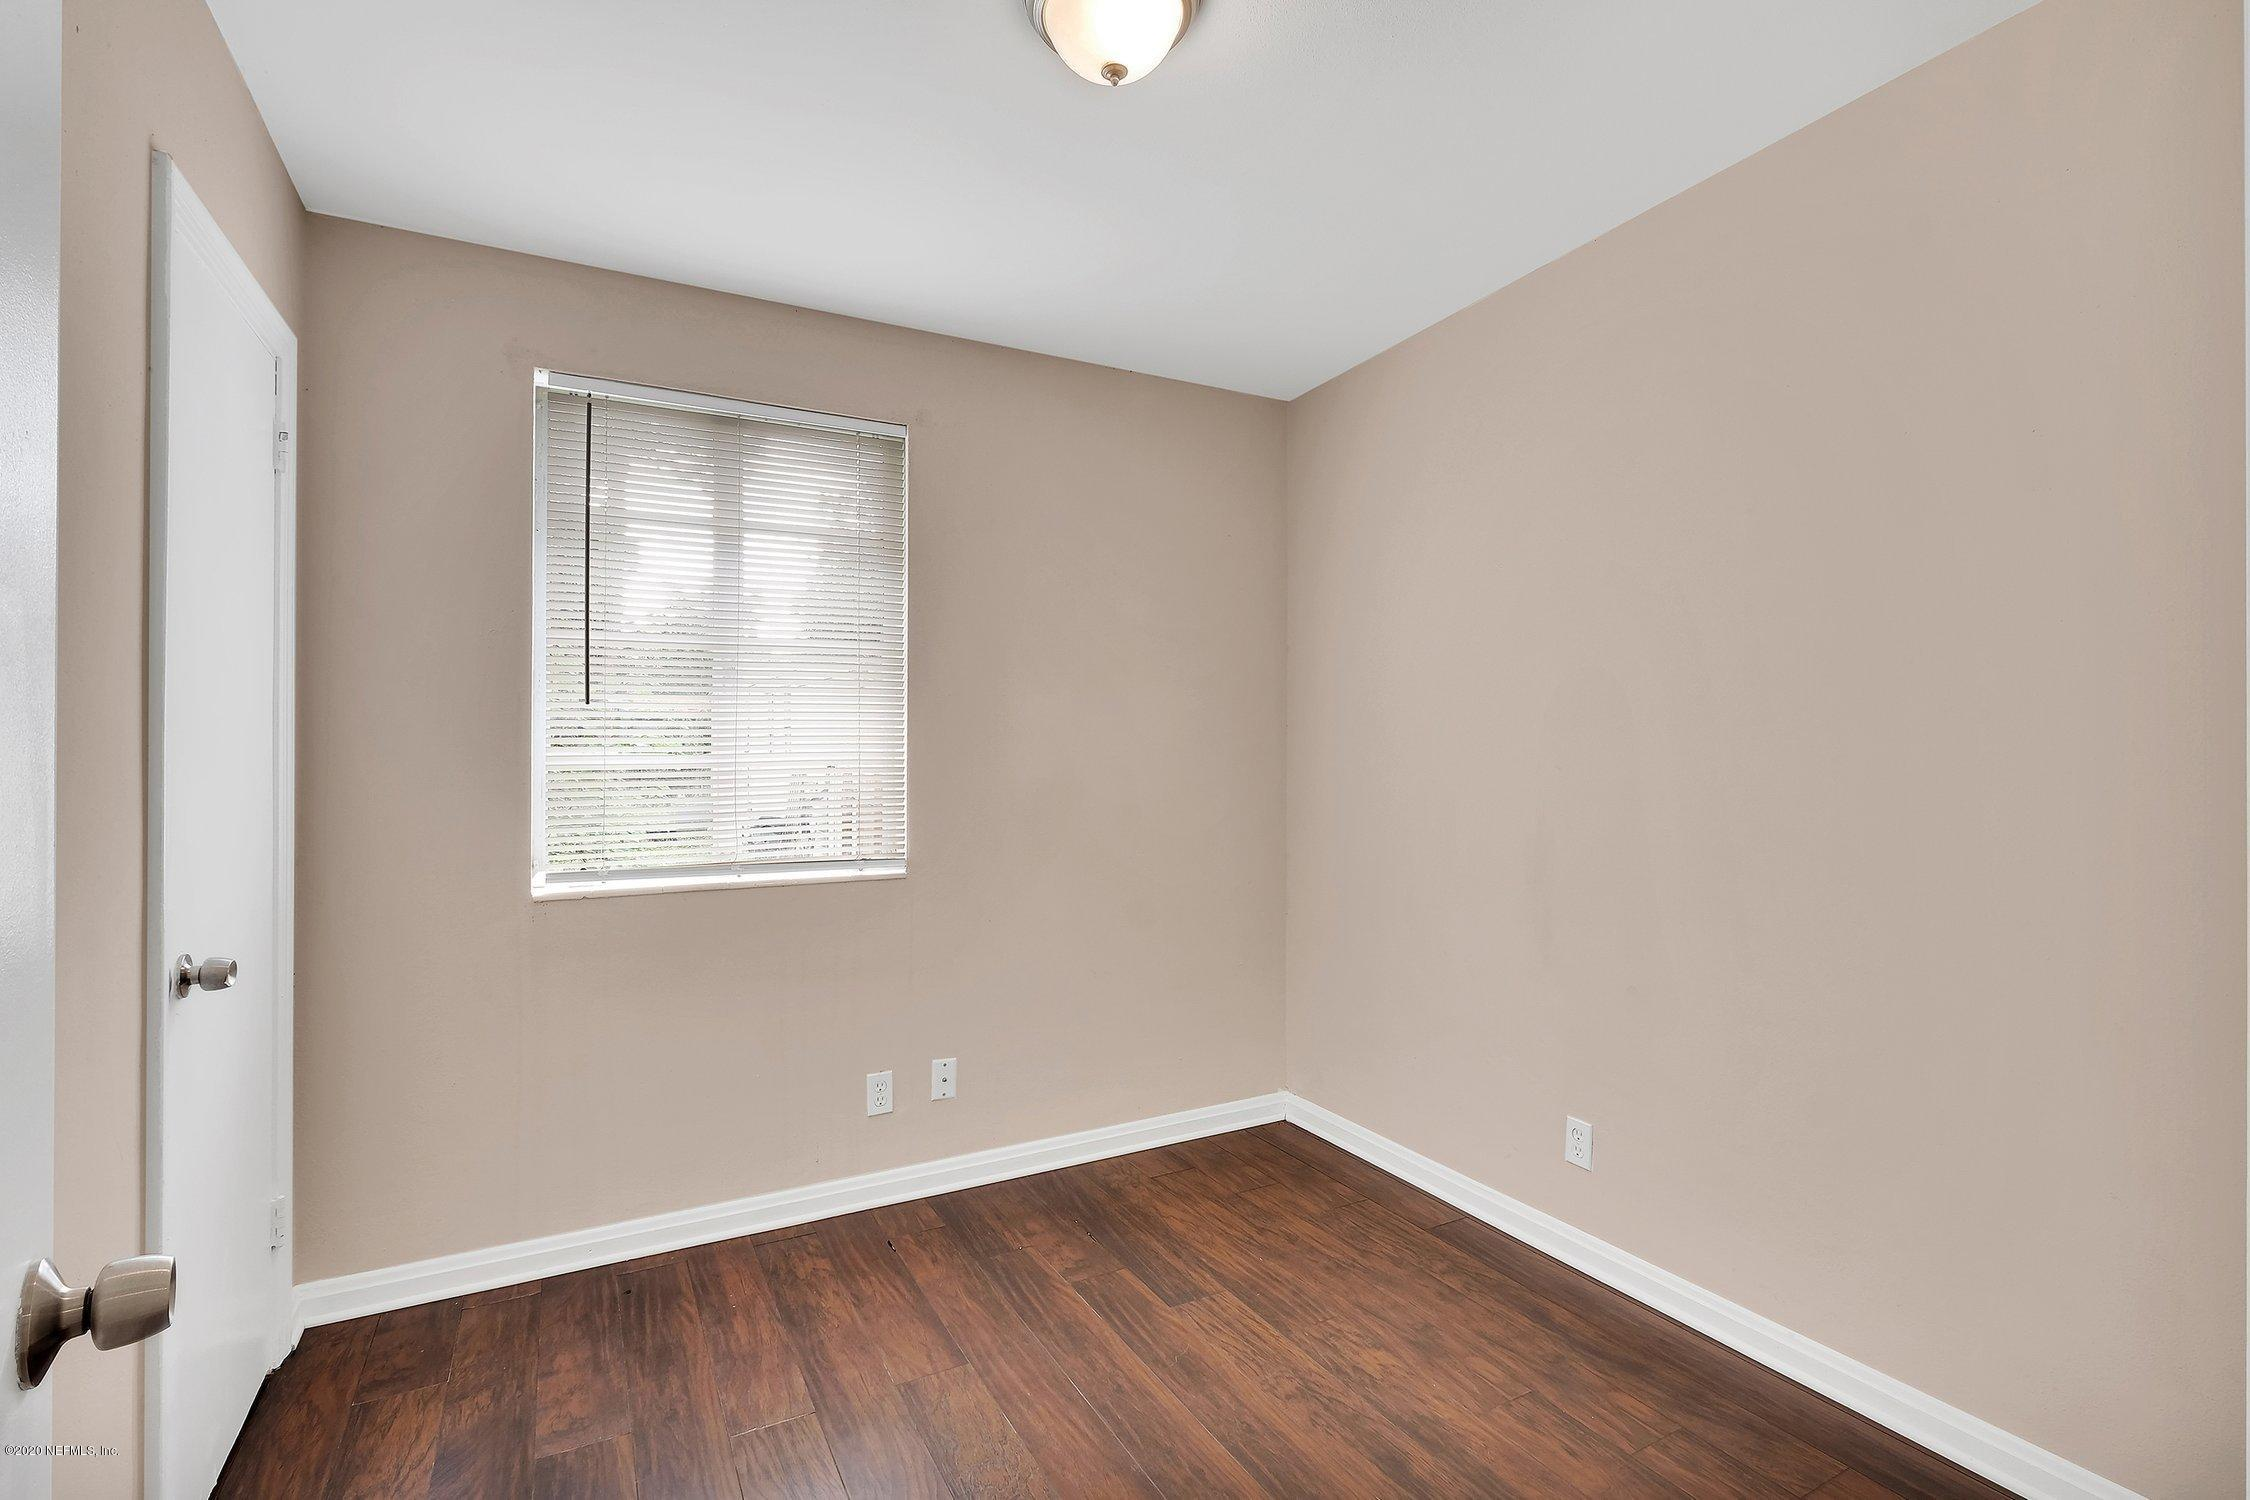 6921 RESTLAWN, JACKSONVILLE, FLORIDA 32208, 4 Bedrooms Bedrooms, ,2 BathroomsBathrooms,Residential,For sale,RESTLAWN,1082122